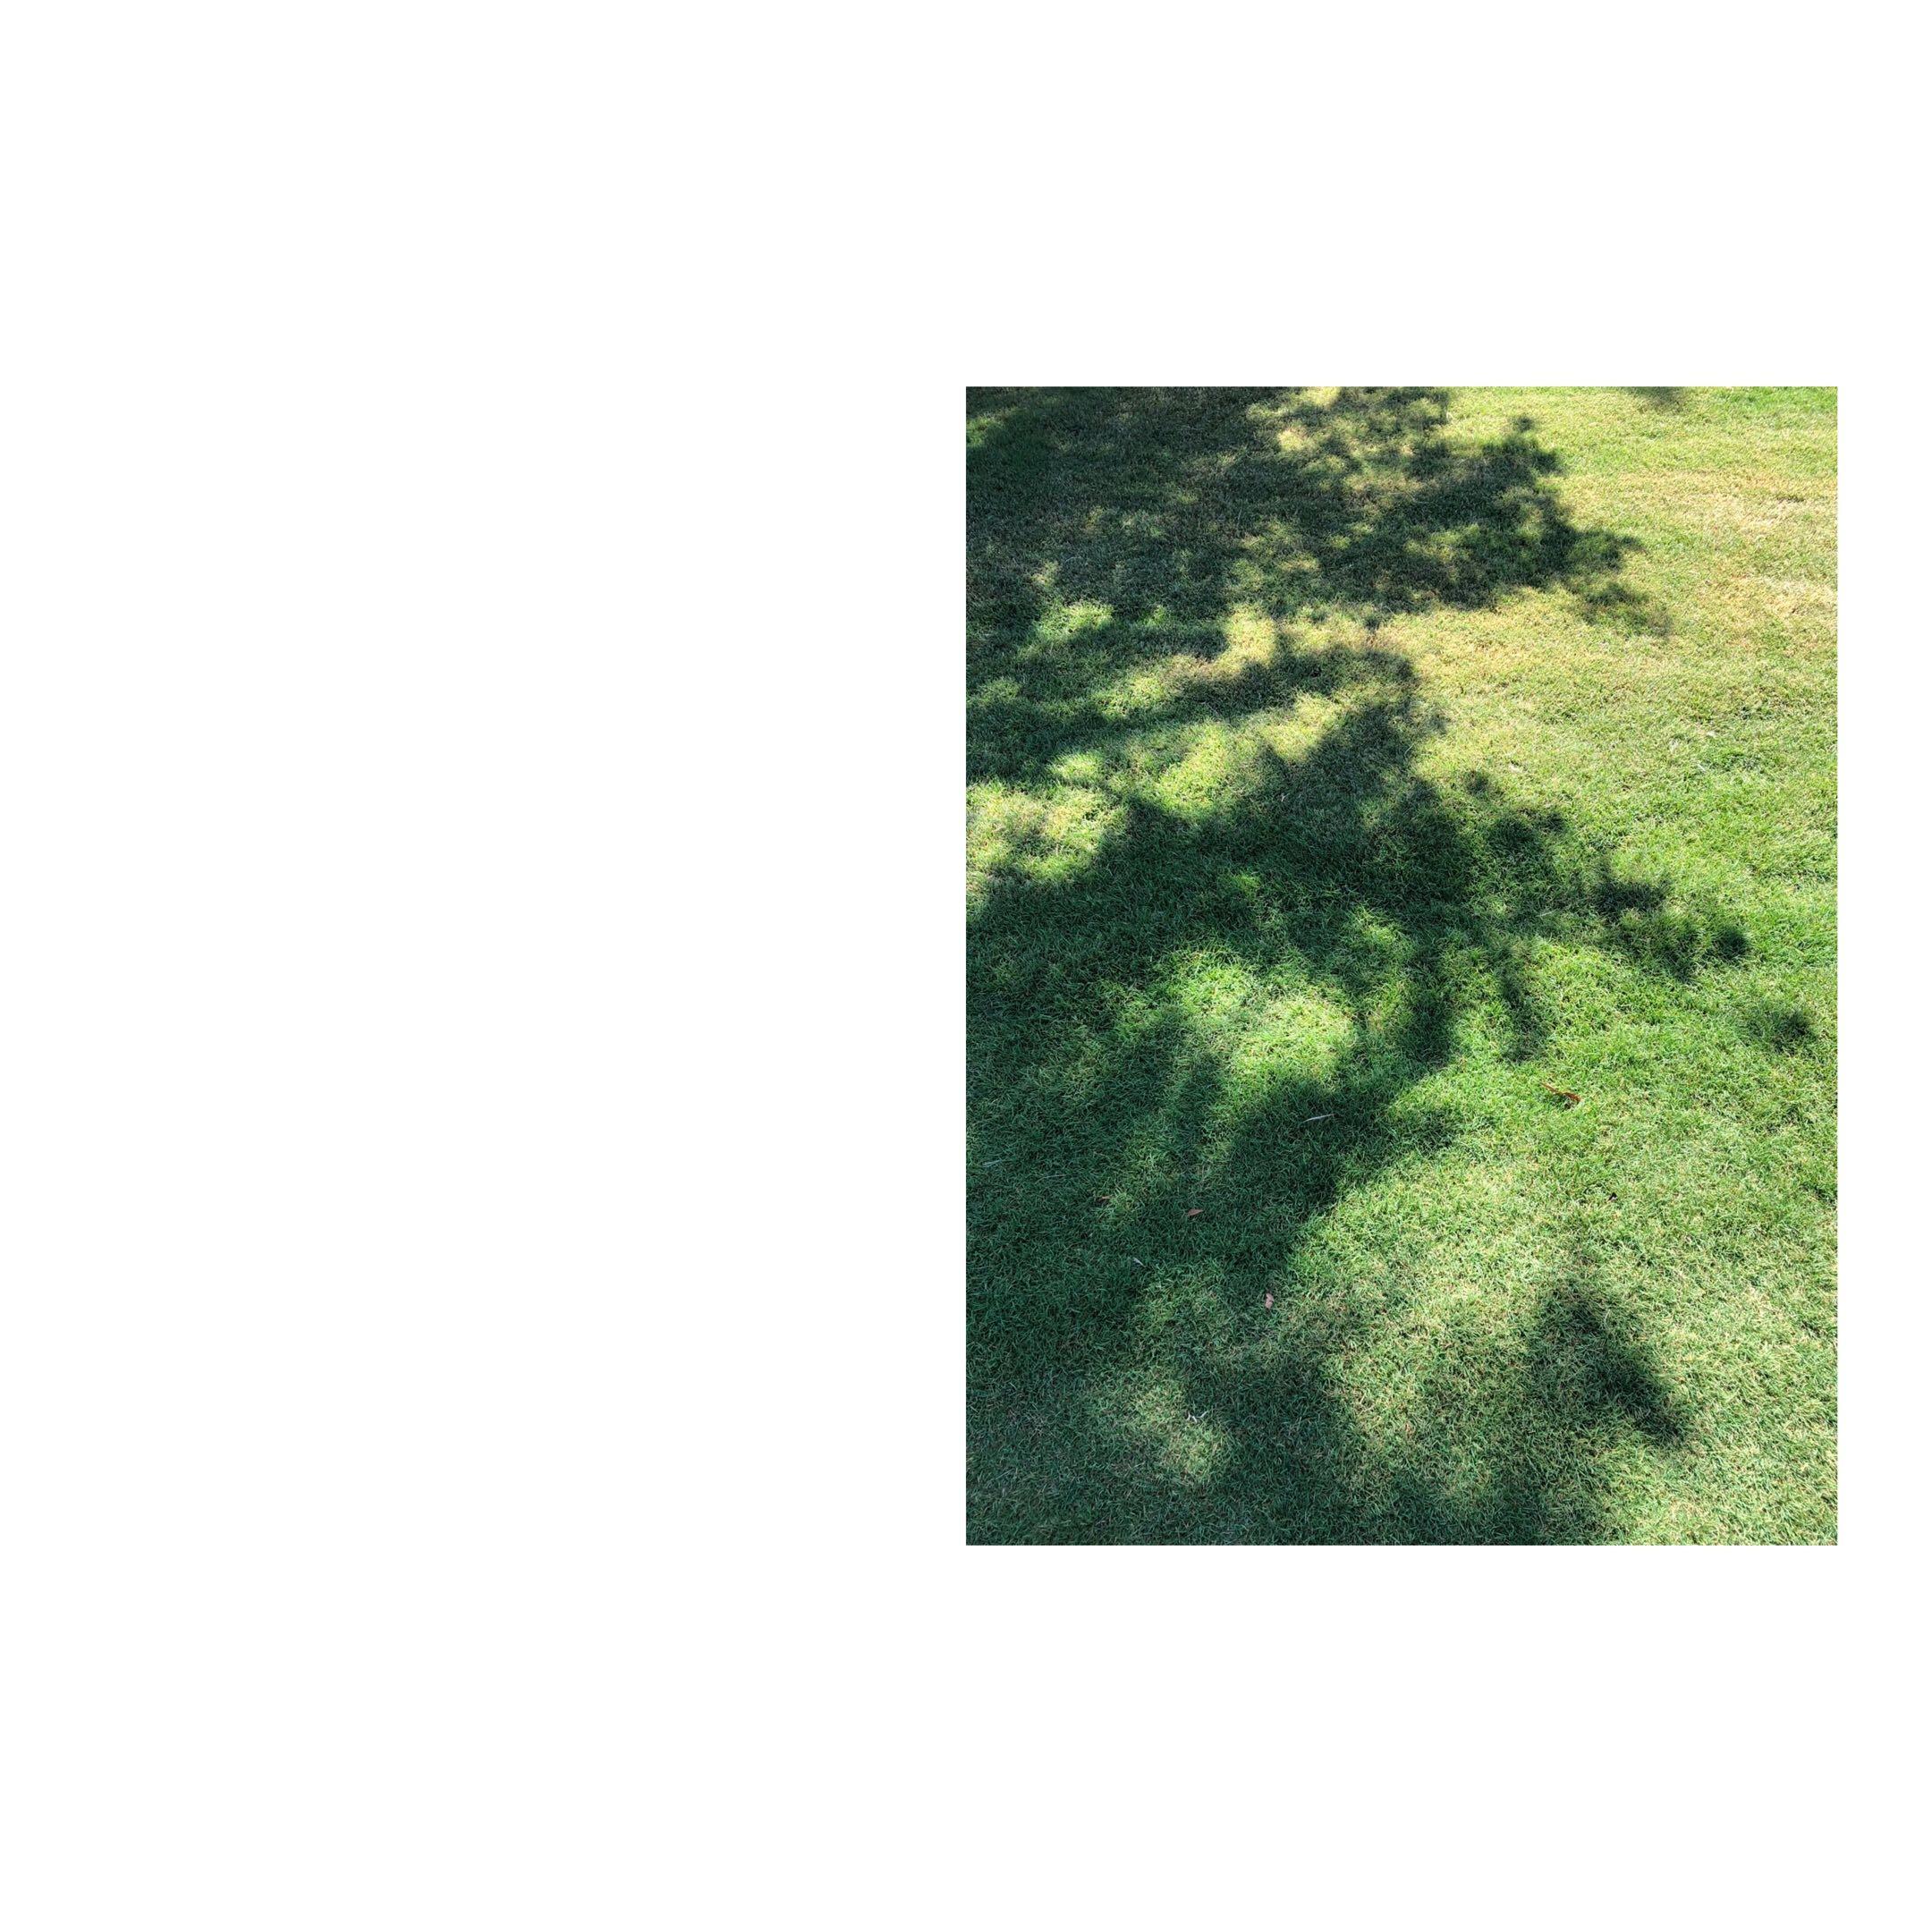 tree's shadow on grass